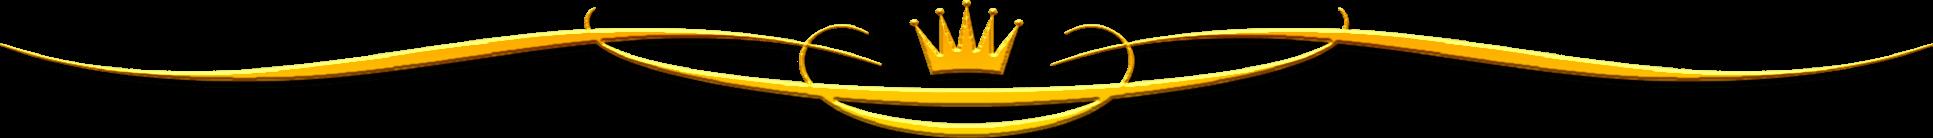 crown-line